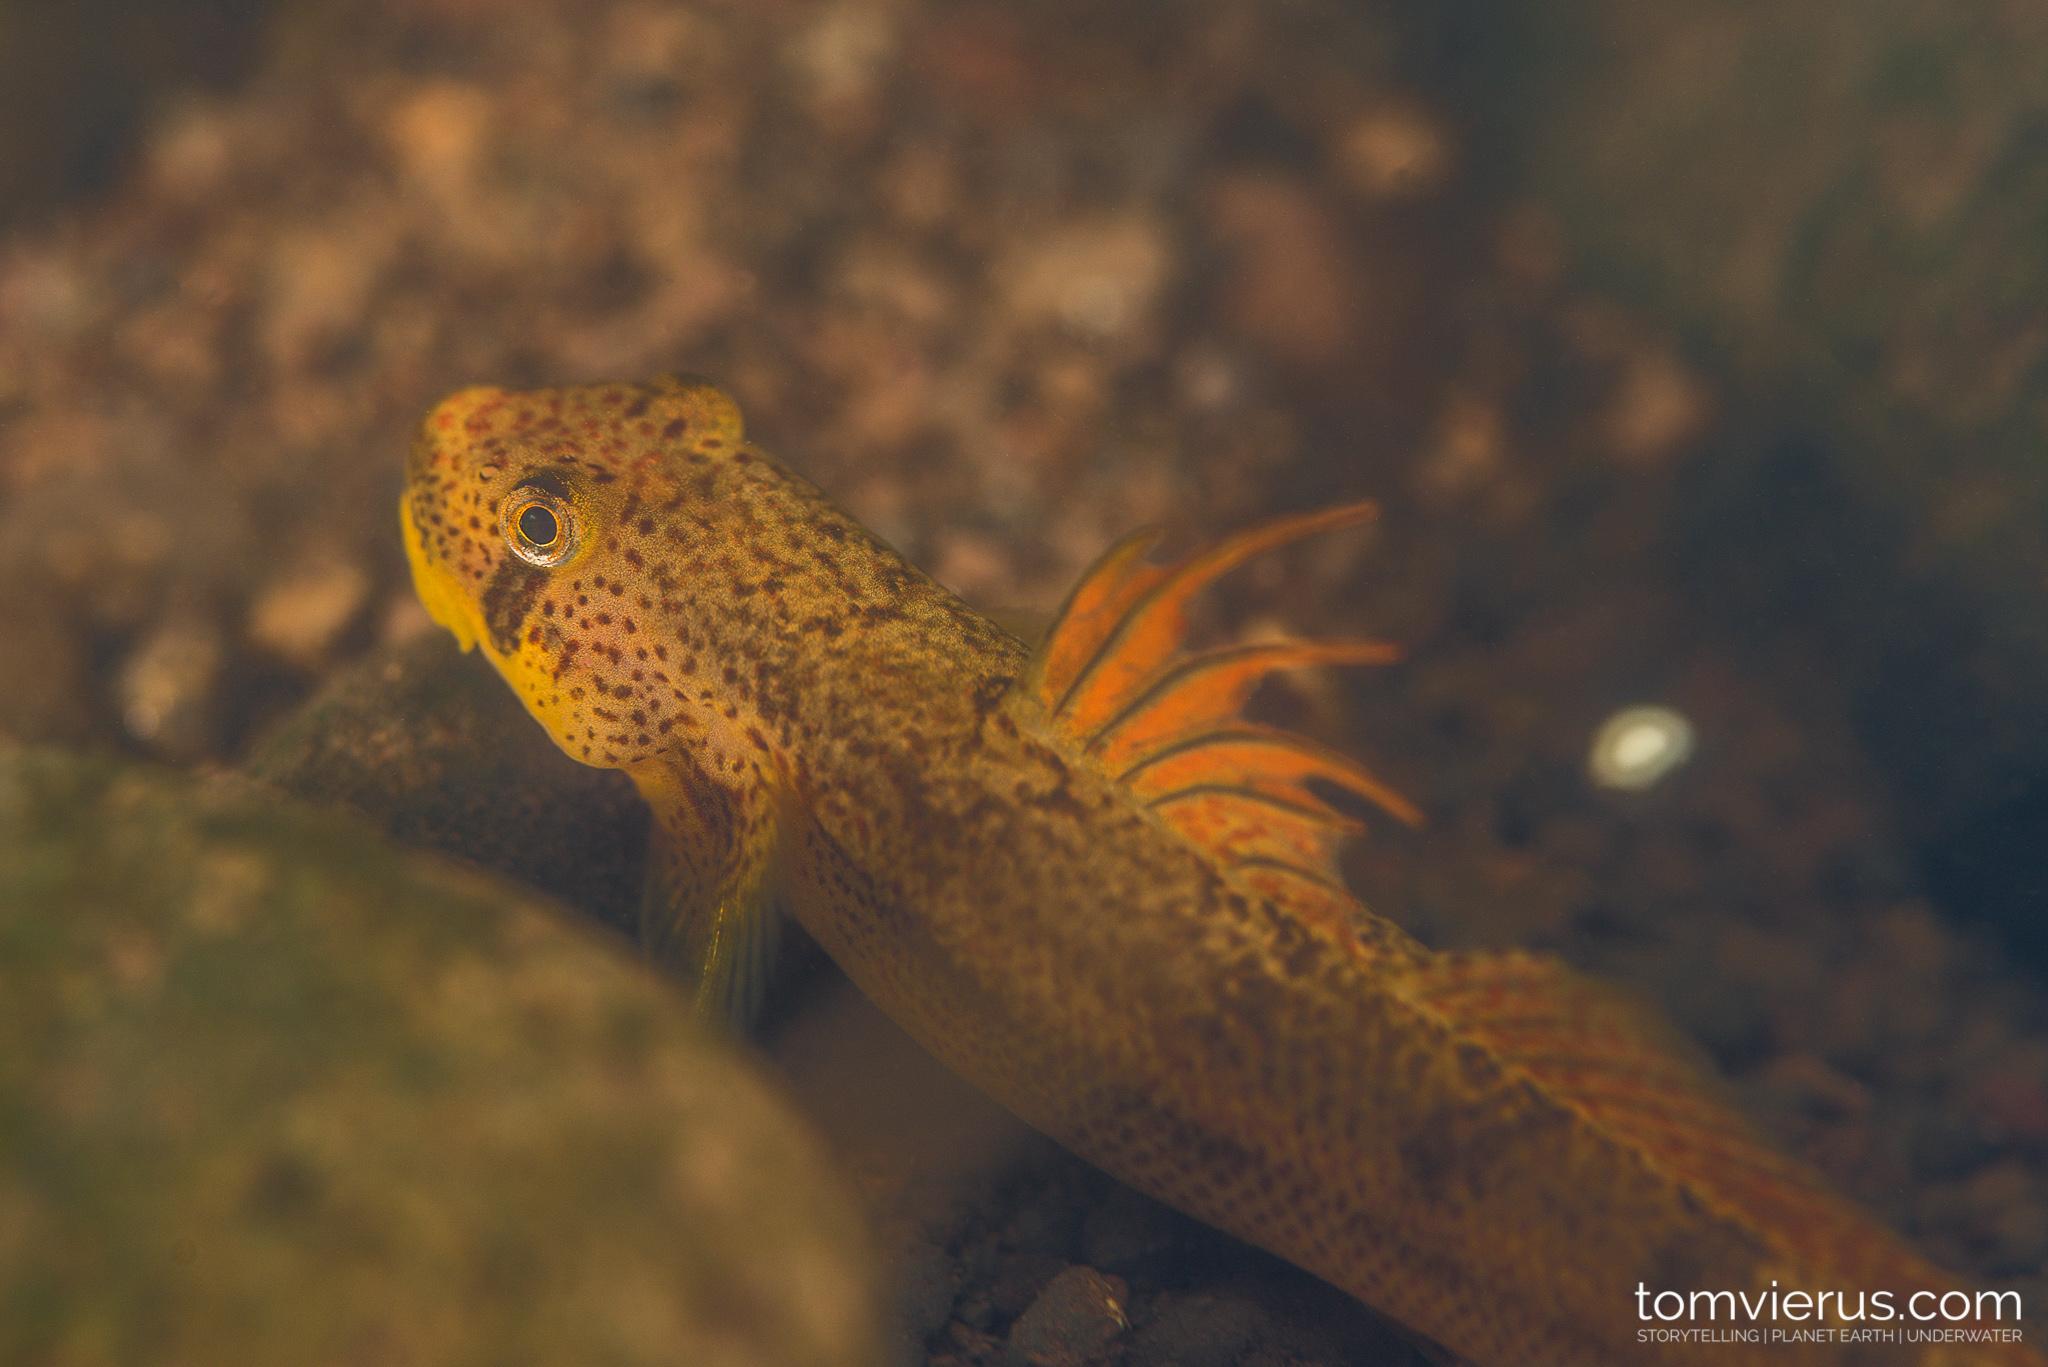 Stream, tiver, underwater, fish, tropics, fish life,